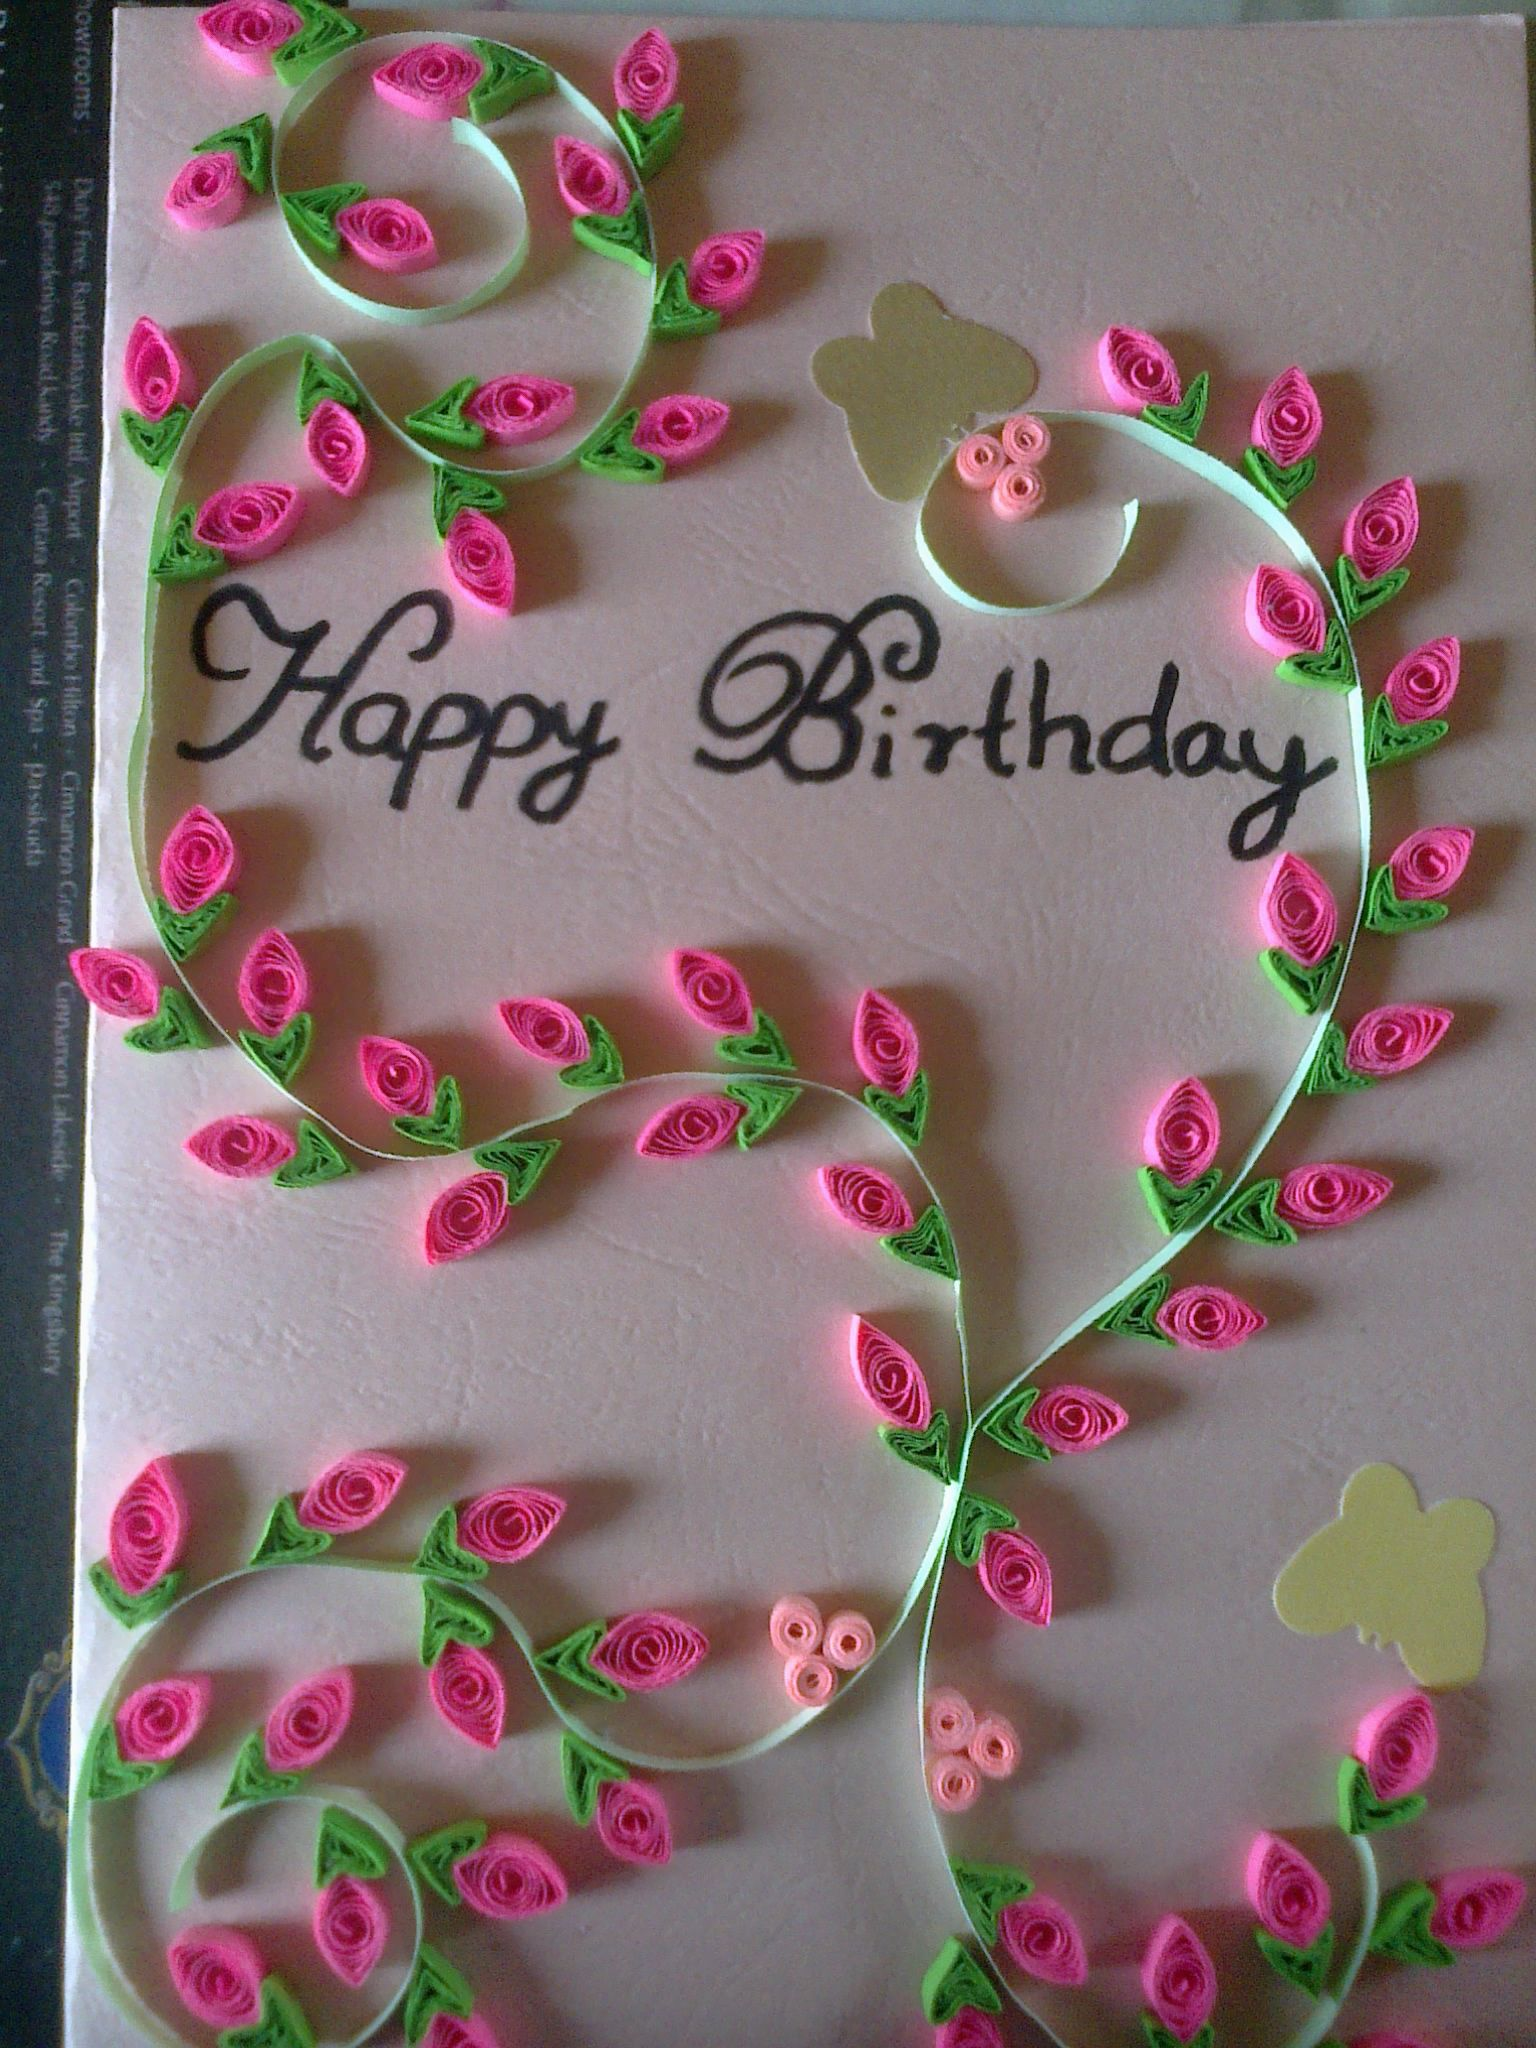 Birthday Card For Sister Handmade Birthday Cards Quilling Cards Sister Birthday Card